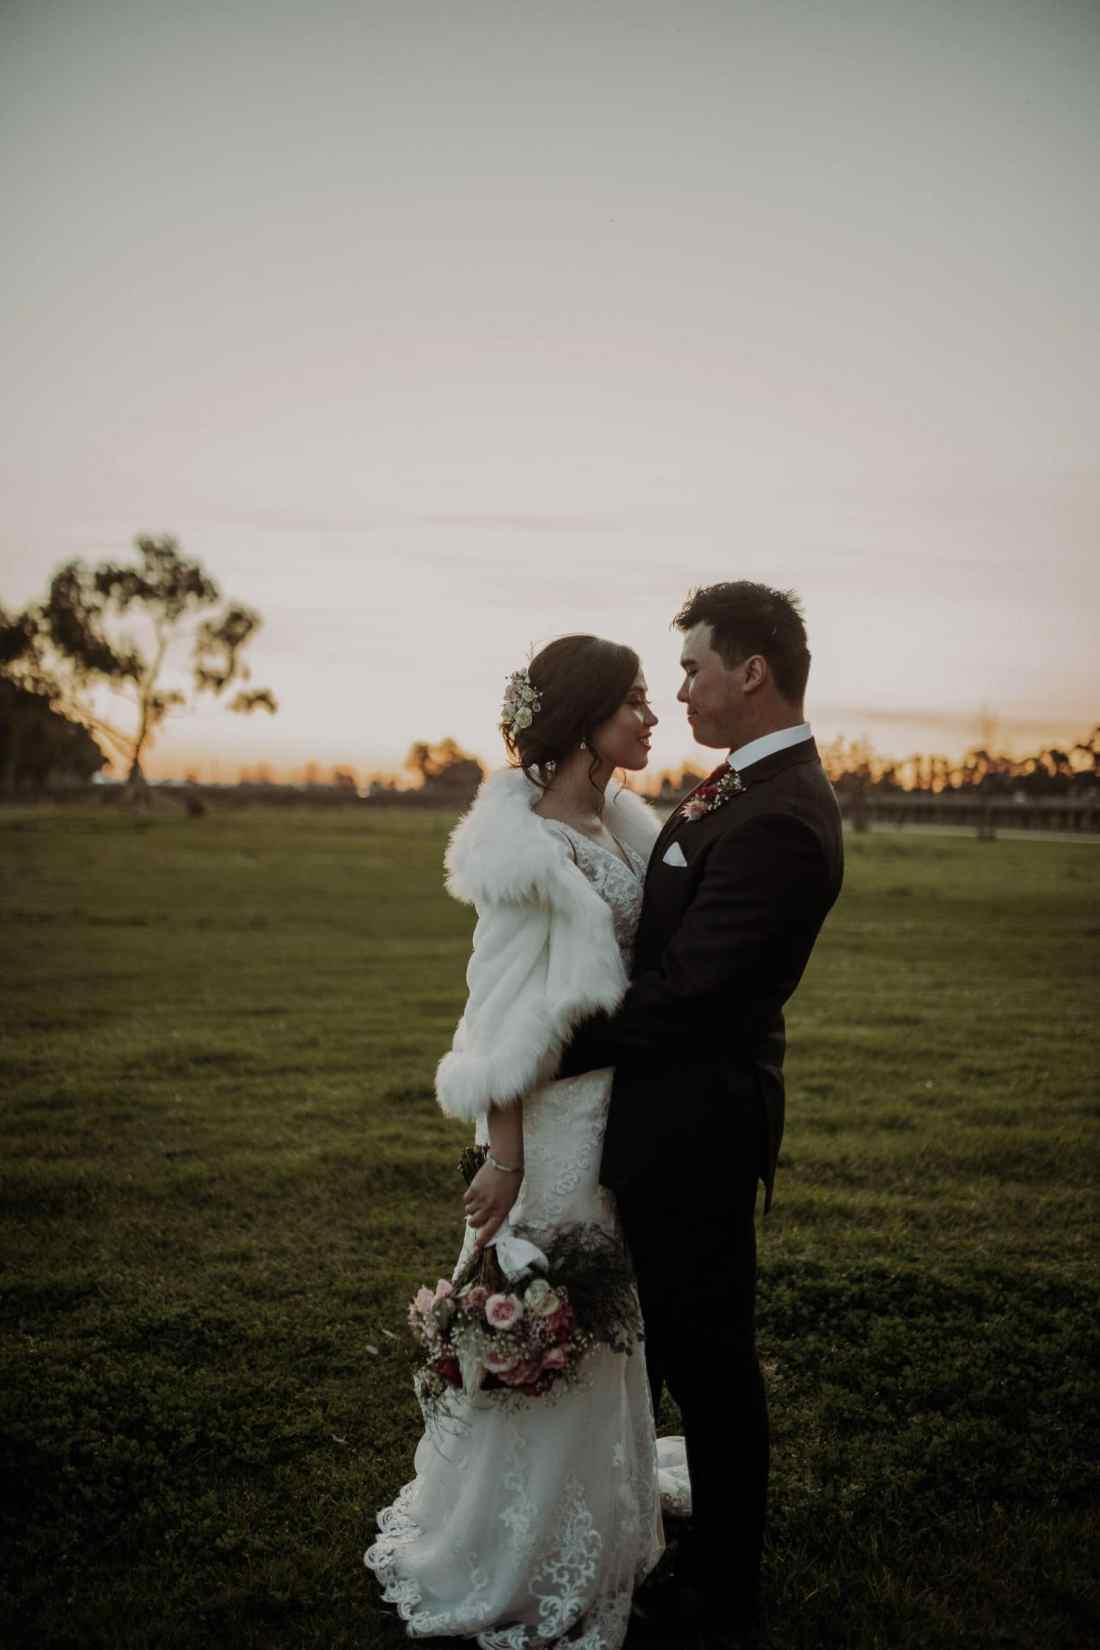 Ebony Blush Photography   Perth Wedding Photographer   Photography + Film   Sandalford Winery Wedding   Perth Photography + Film   Como Treasury Wedding   Perth City Wedding   Alex + Mel102